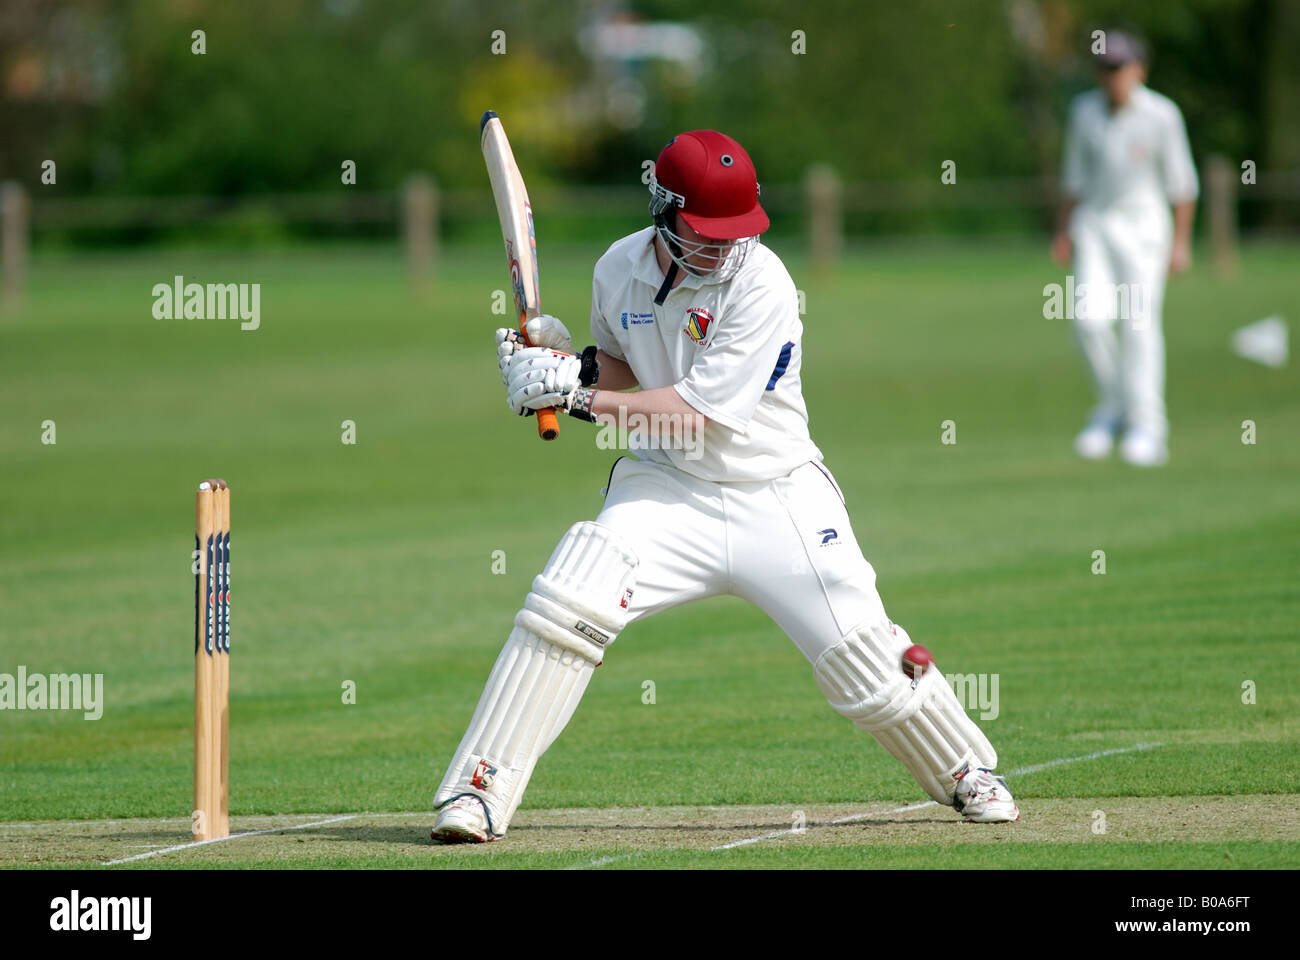 Batsman in village cricket match, UK Stock Photo